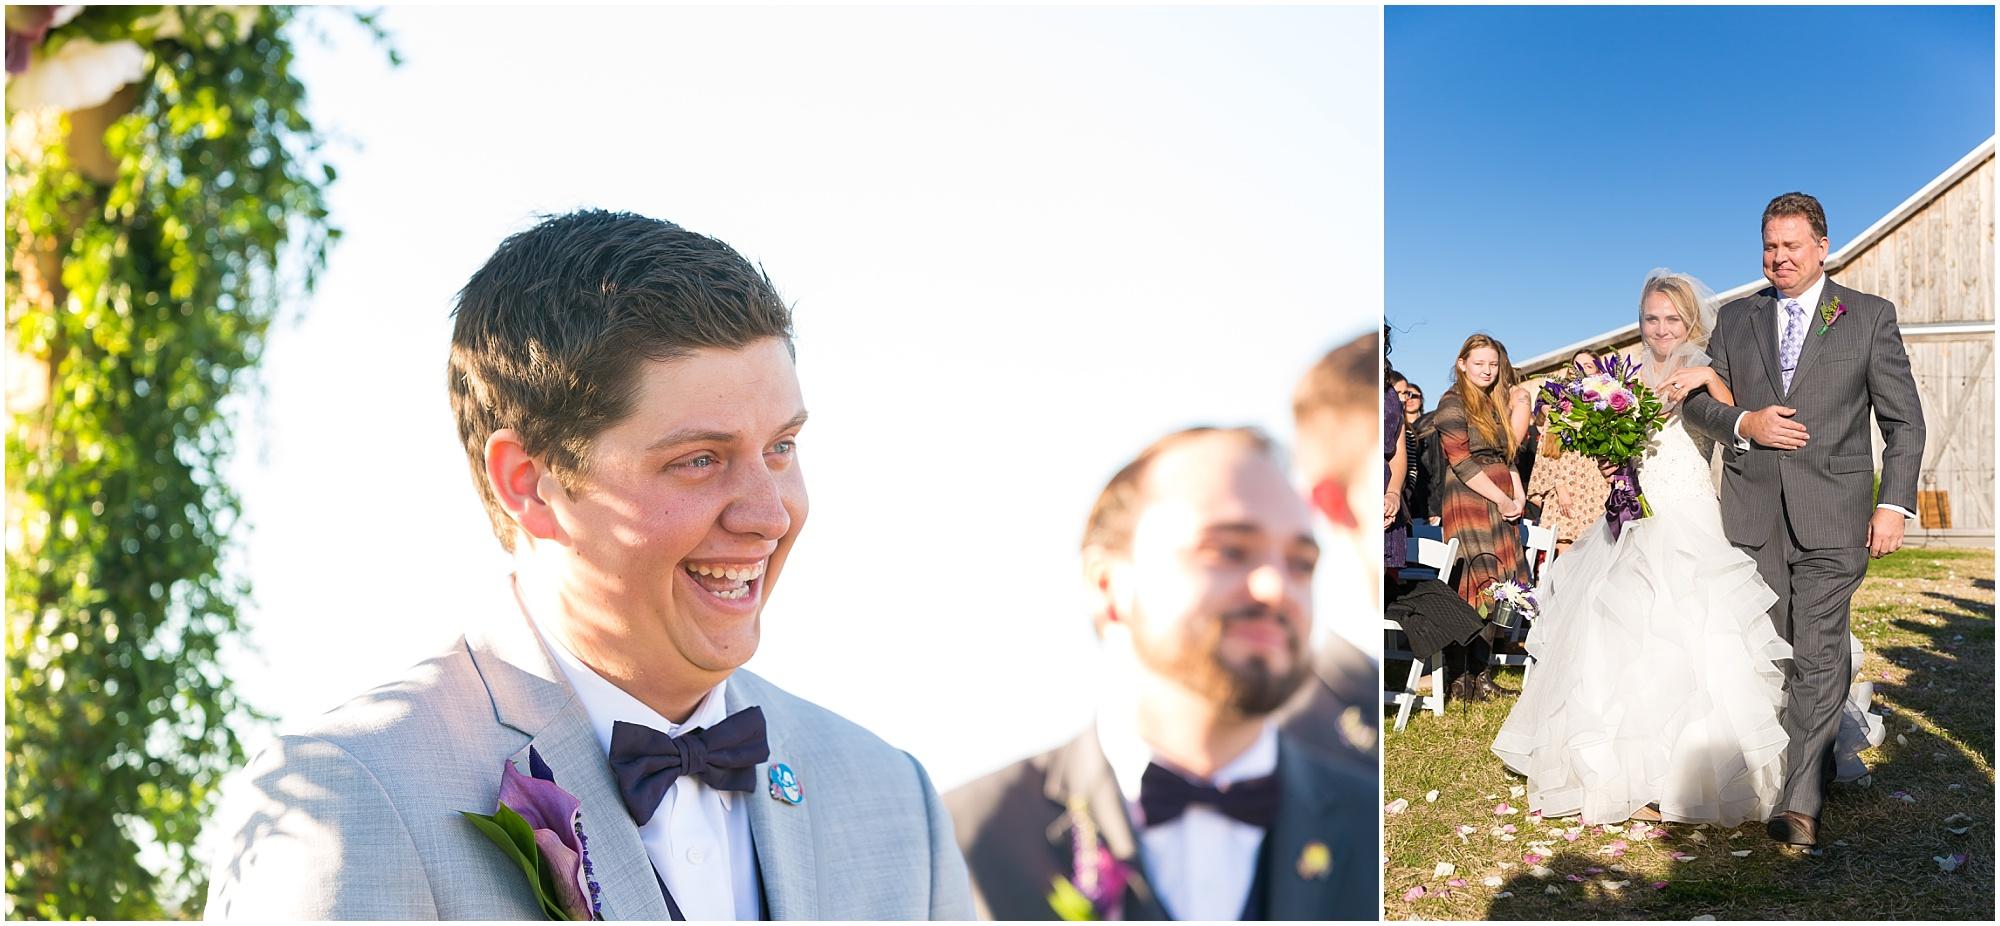 Disney-Inspired-Wedding-Central-Texas_0033.jpg